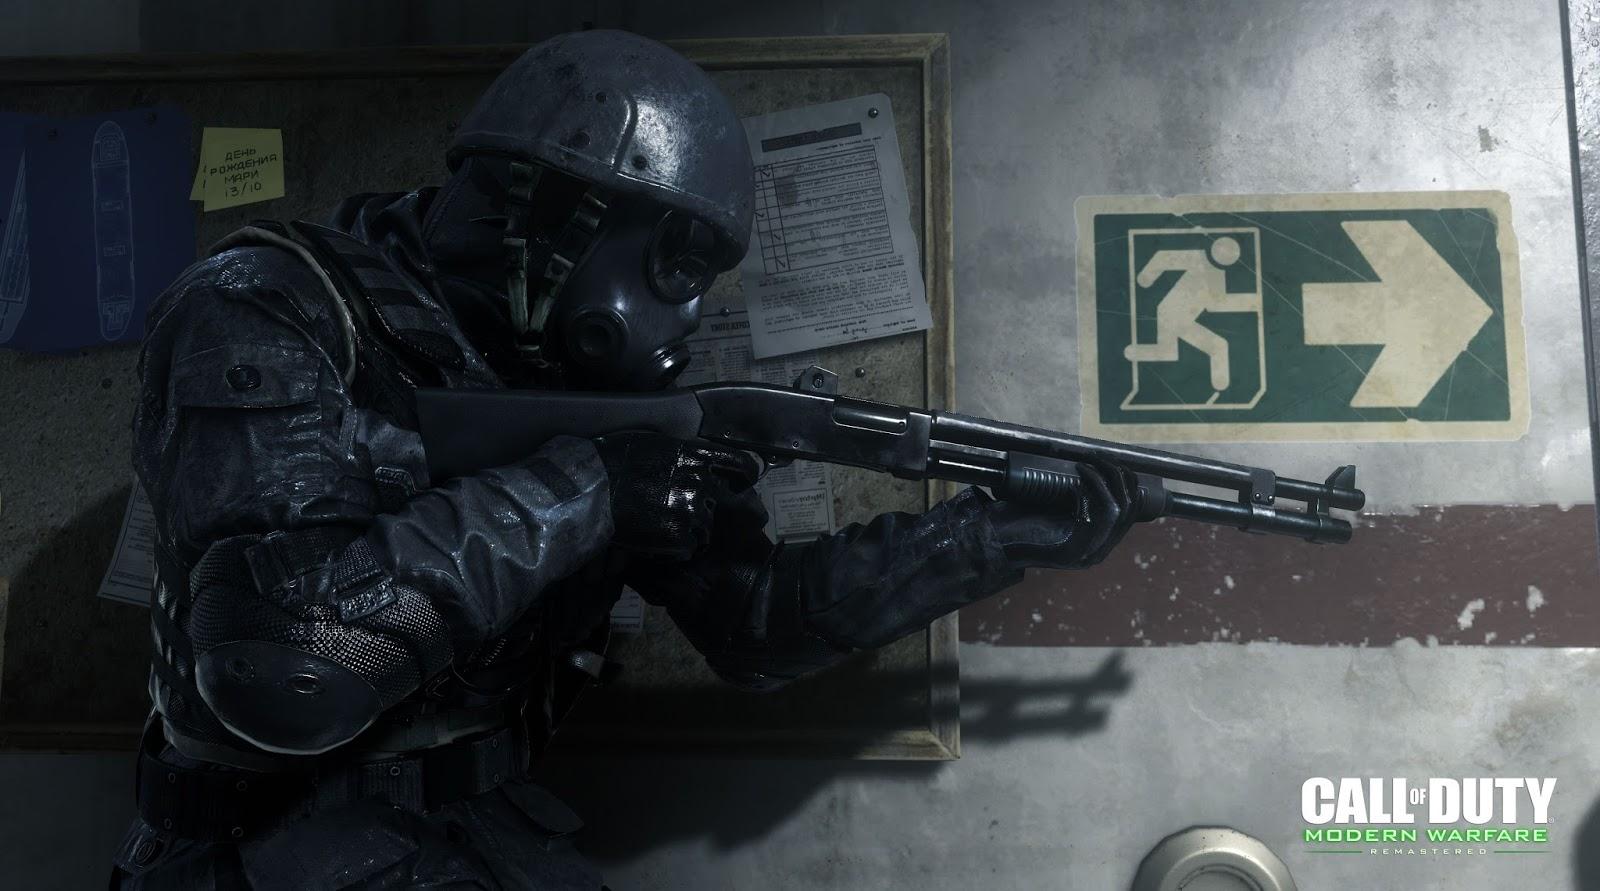 Nuevos mapas llegarán a Call of Duty: Modern Warfare Remastered este 21 de marzo